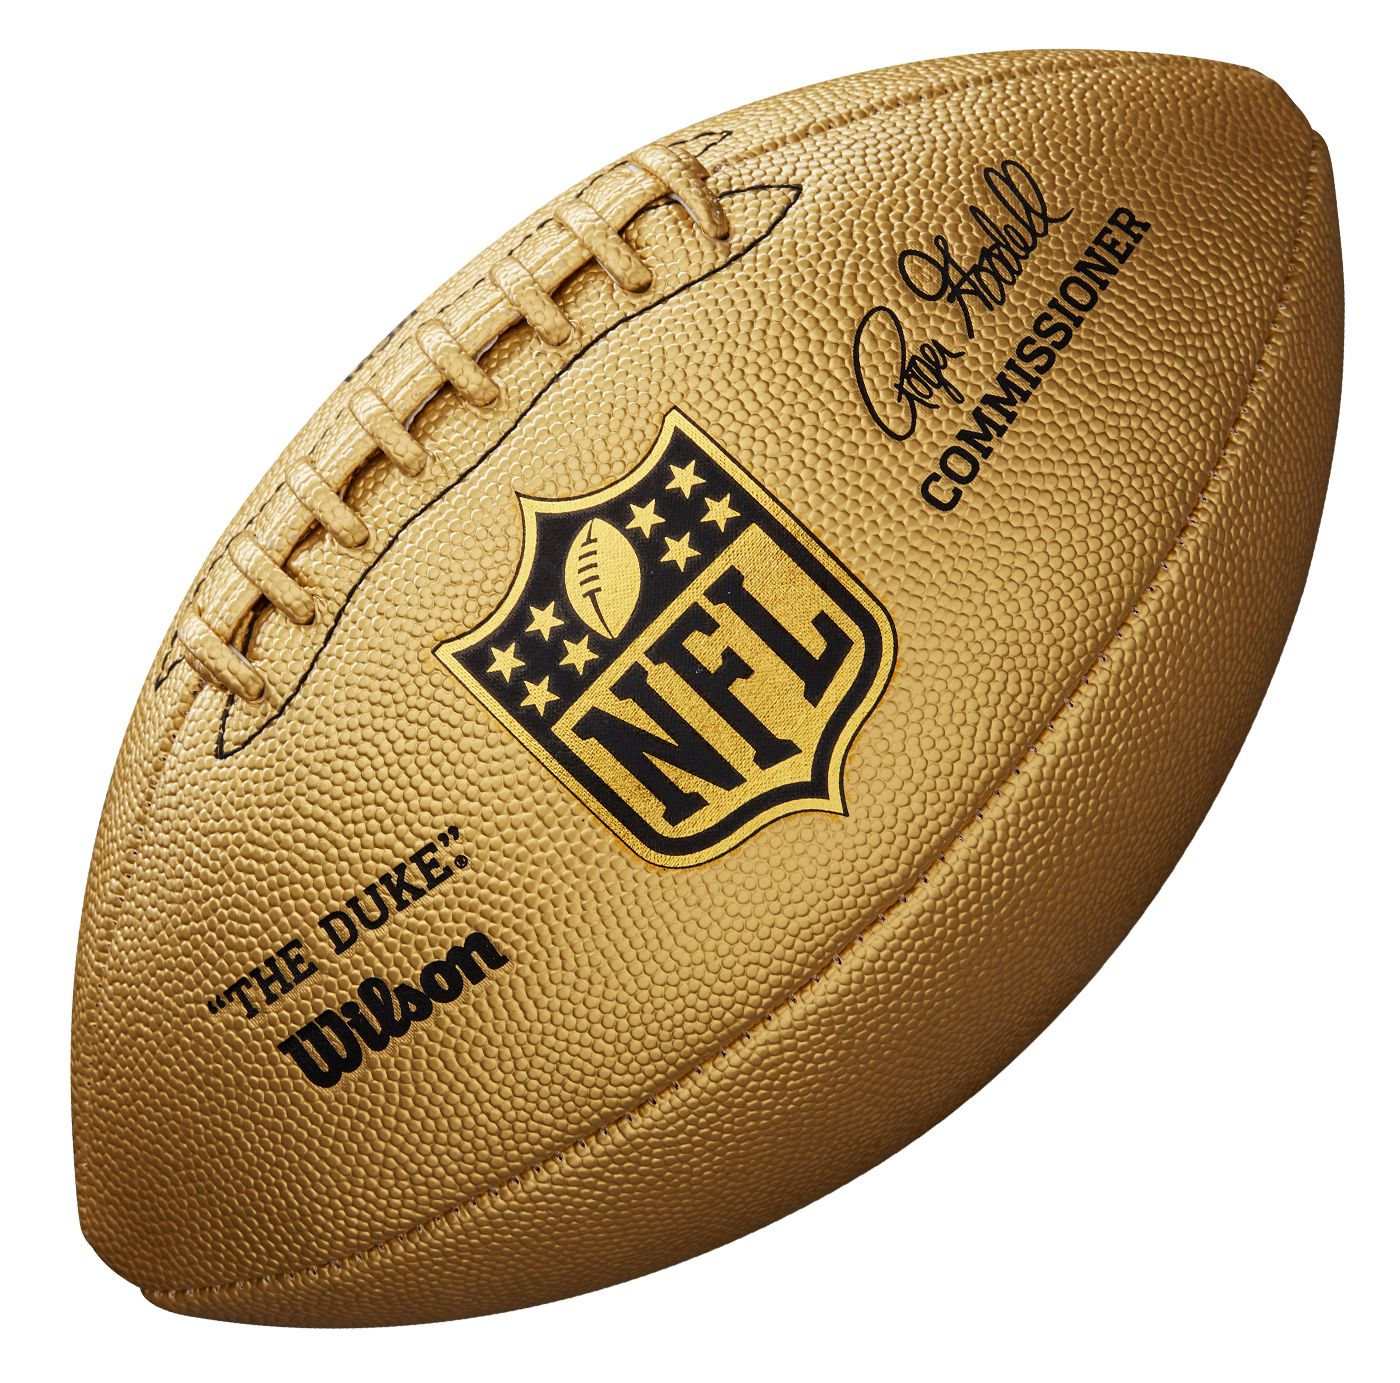 Wilson NFL Pro Replica Metallic Football